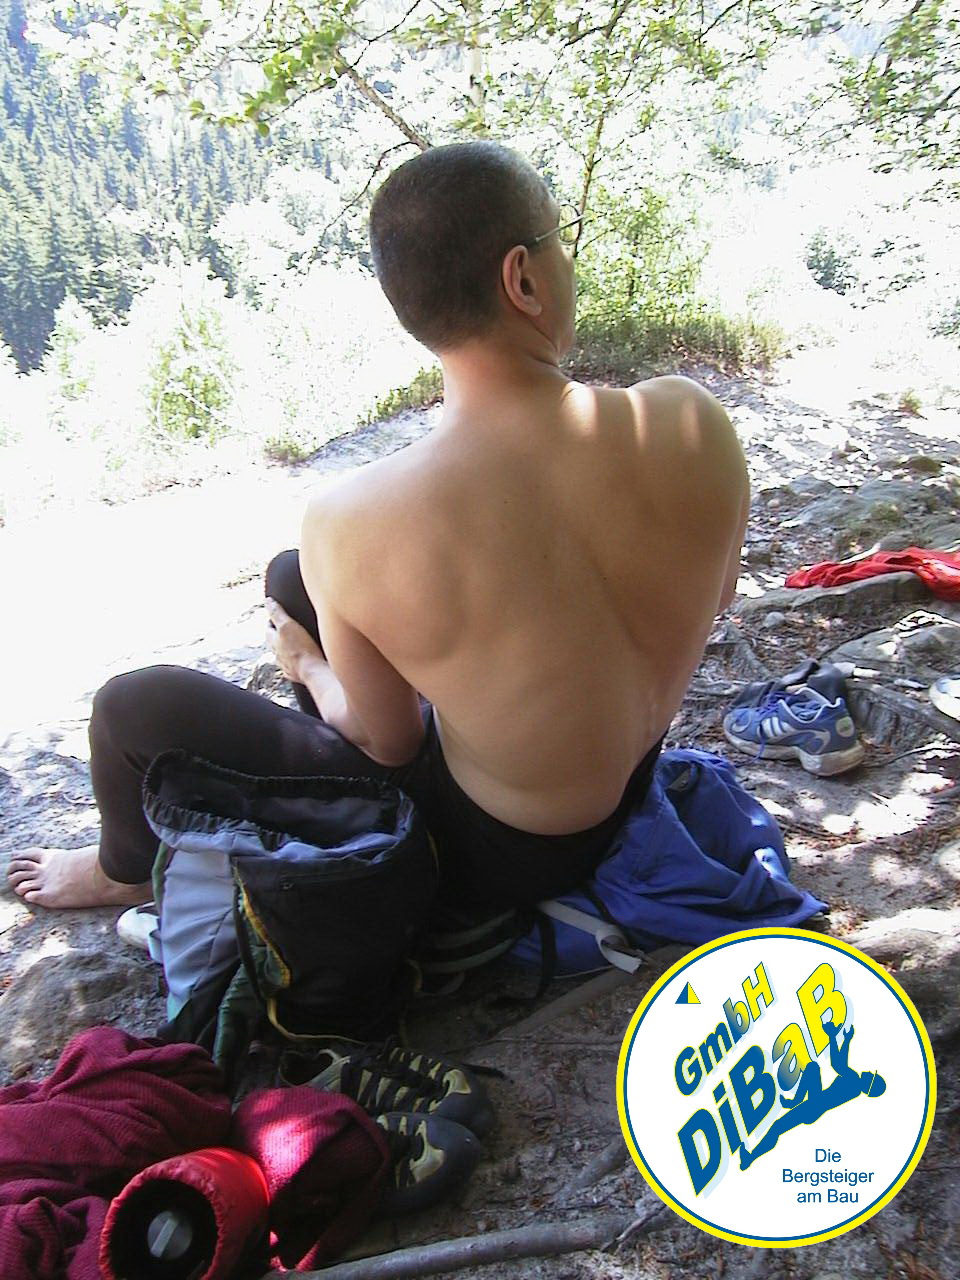 André Hüller in gutem Trainingszustand beim Klettern